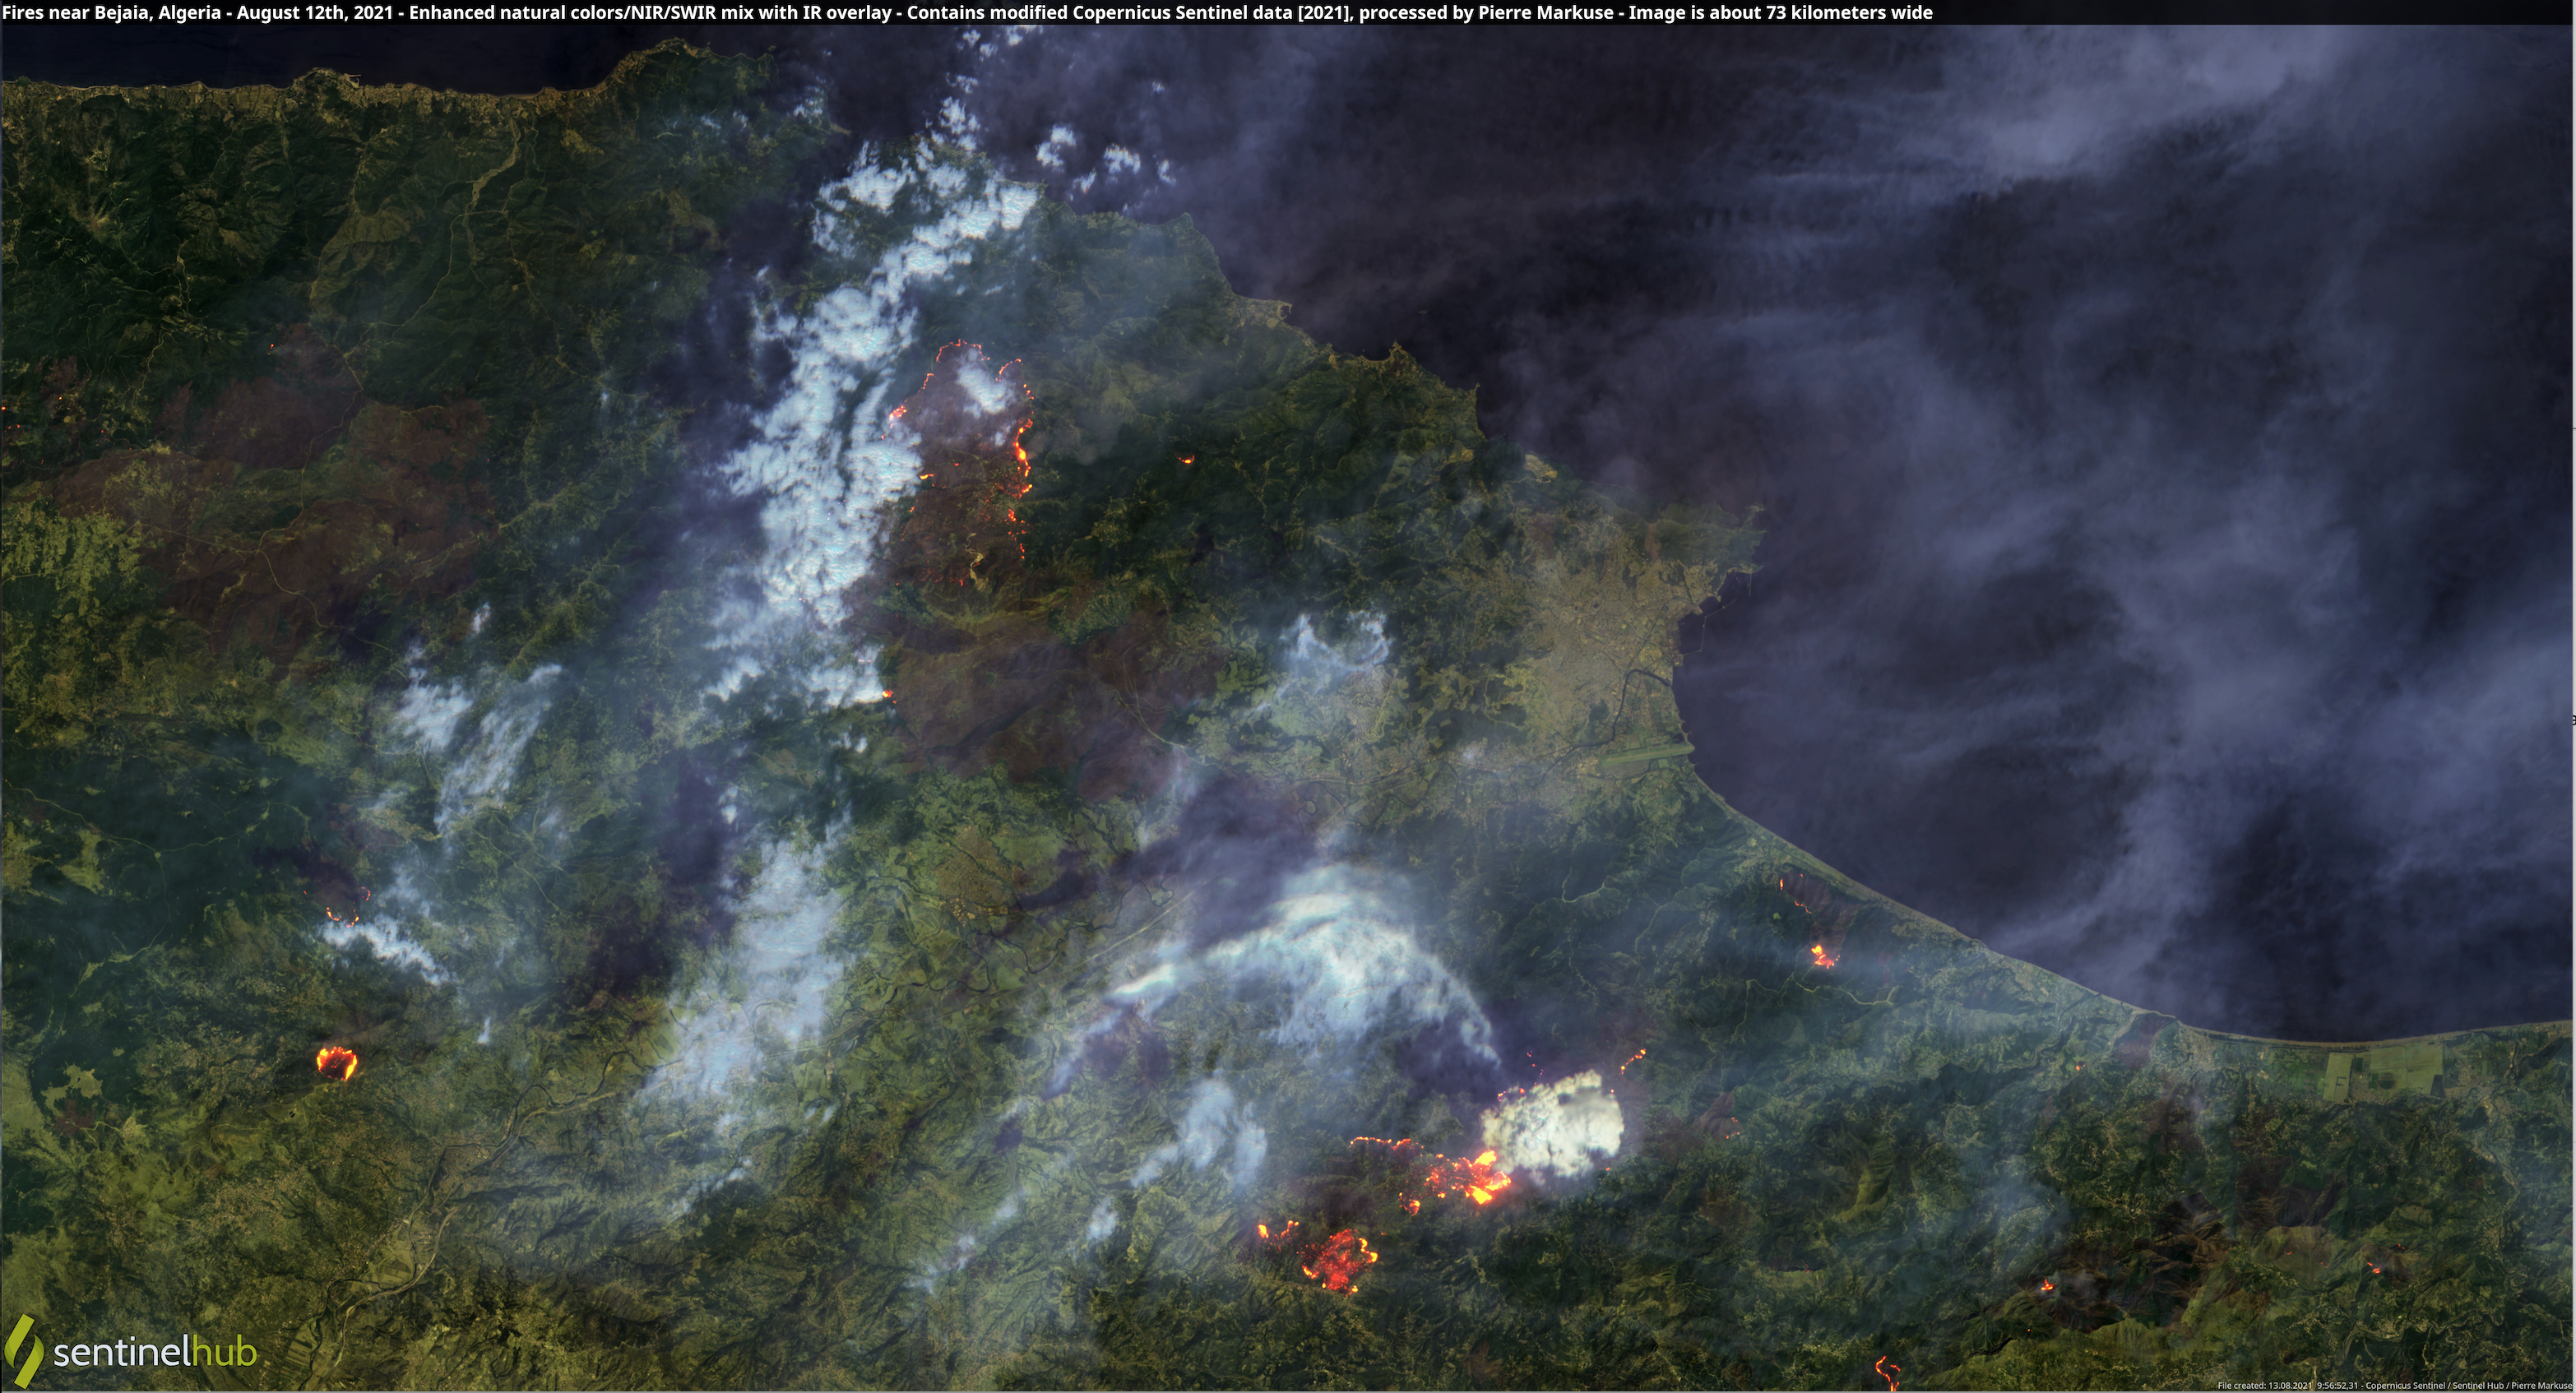 Algeria Fires, 12 August 21 -Sentinel Hub